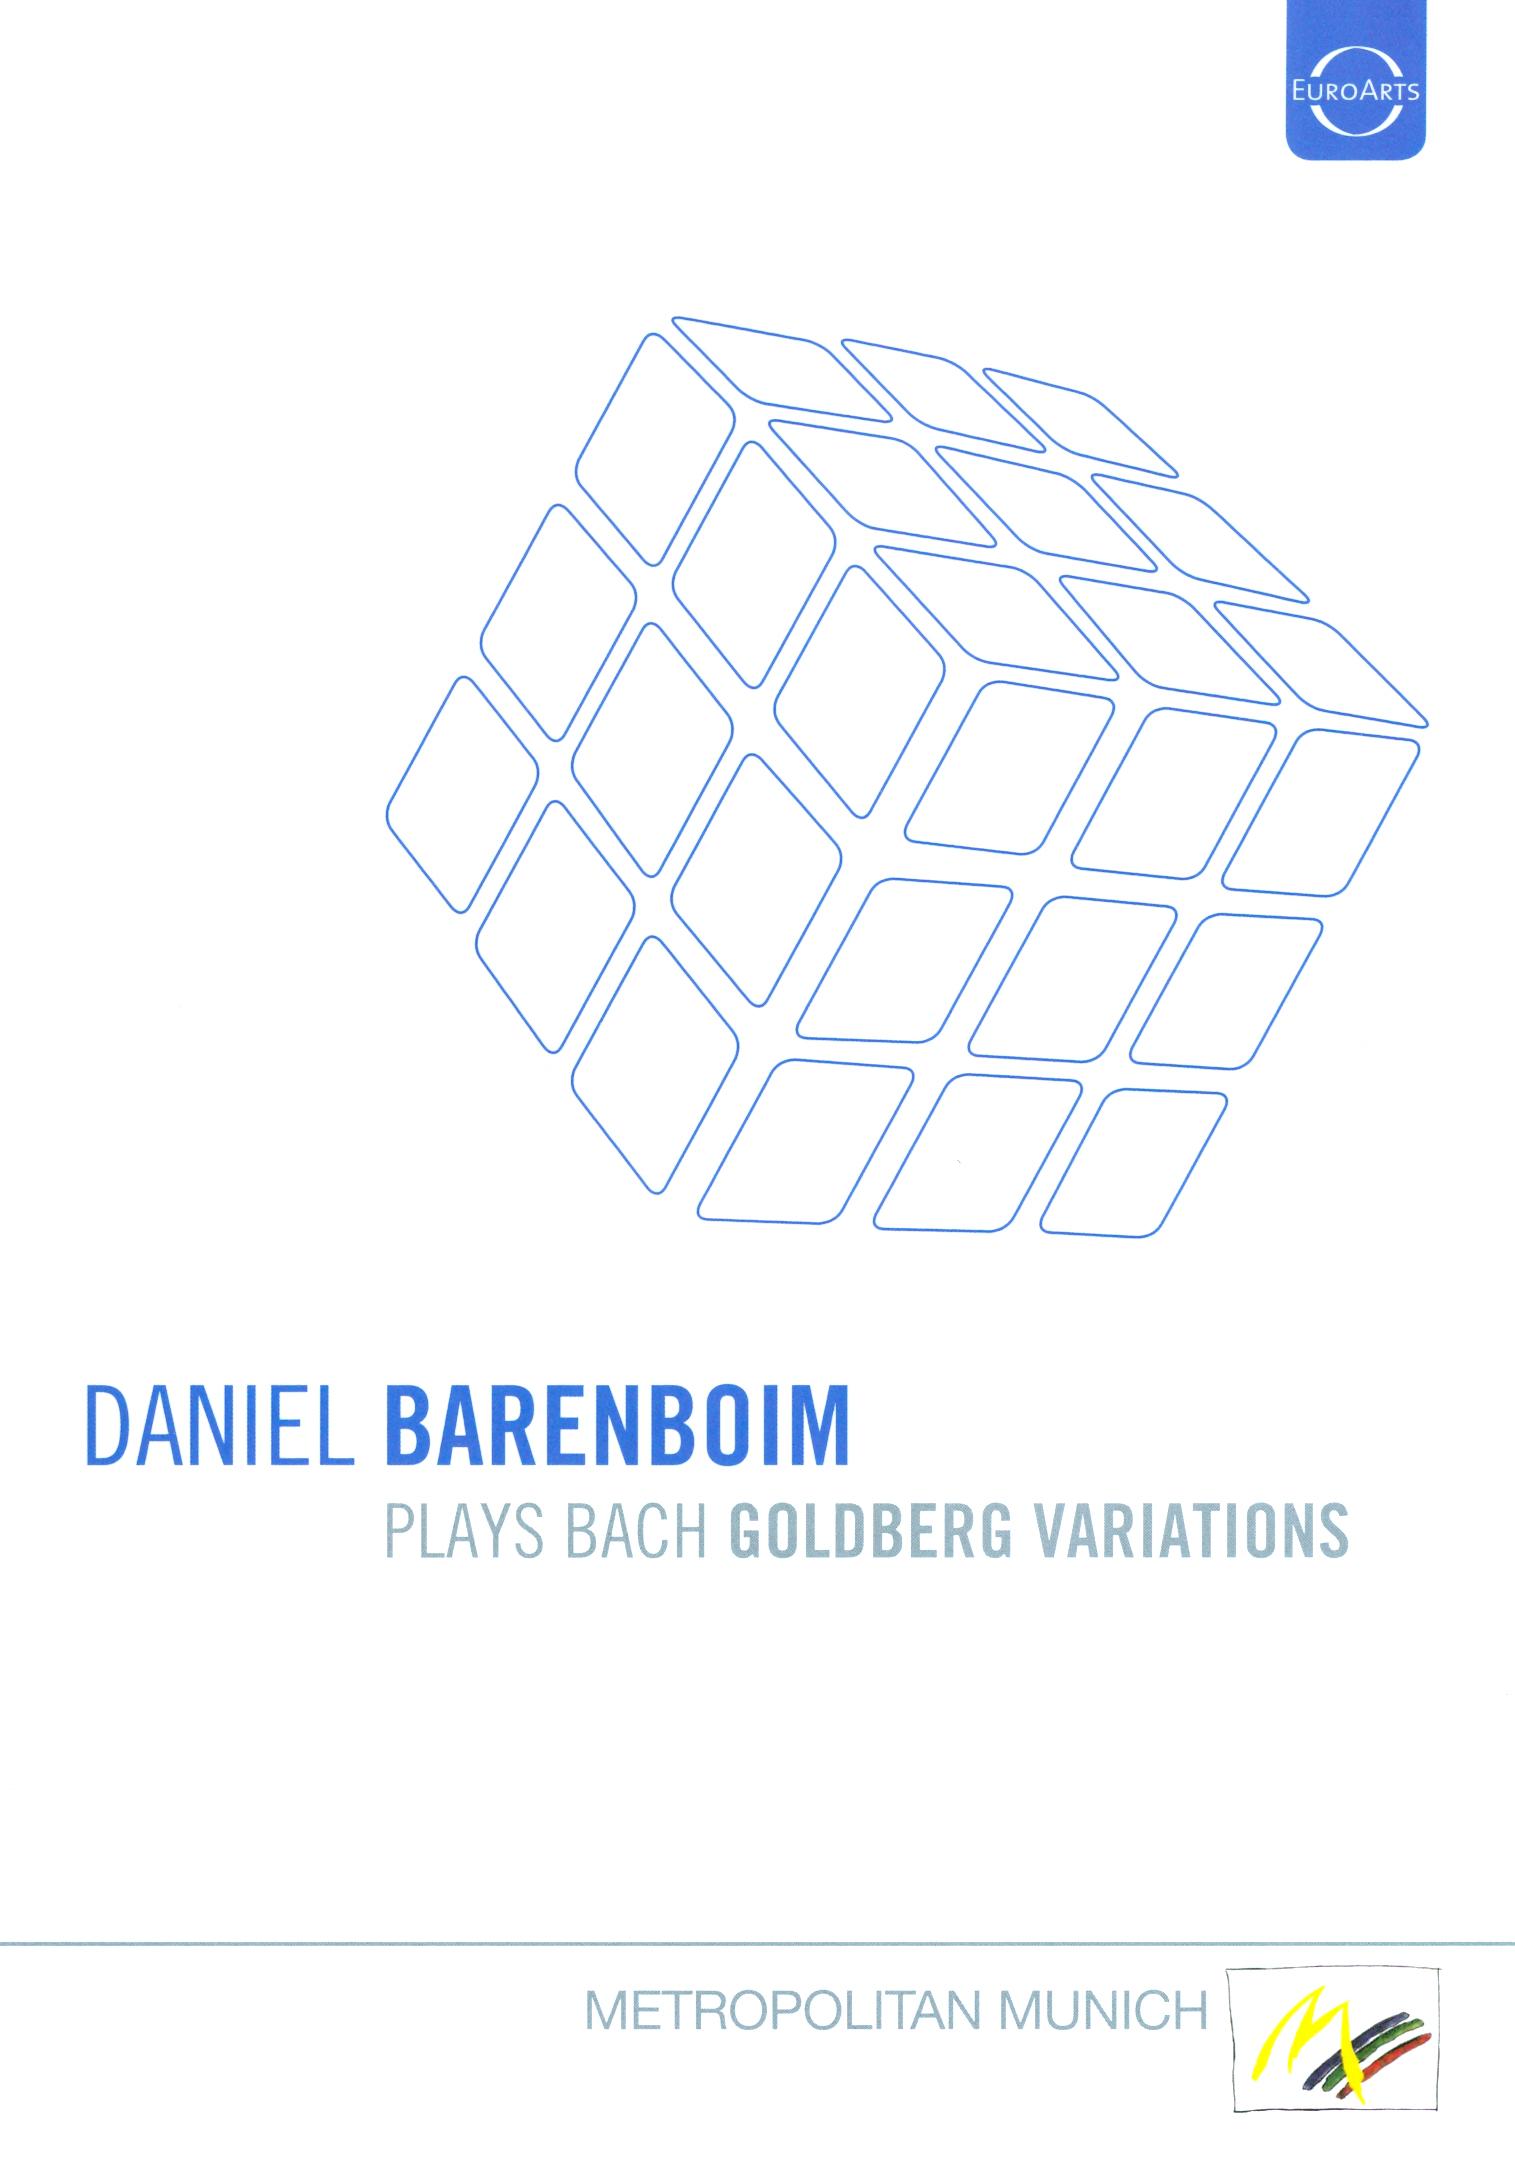 Daniel Barenboim Plays Bach Goldberg Variations